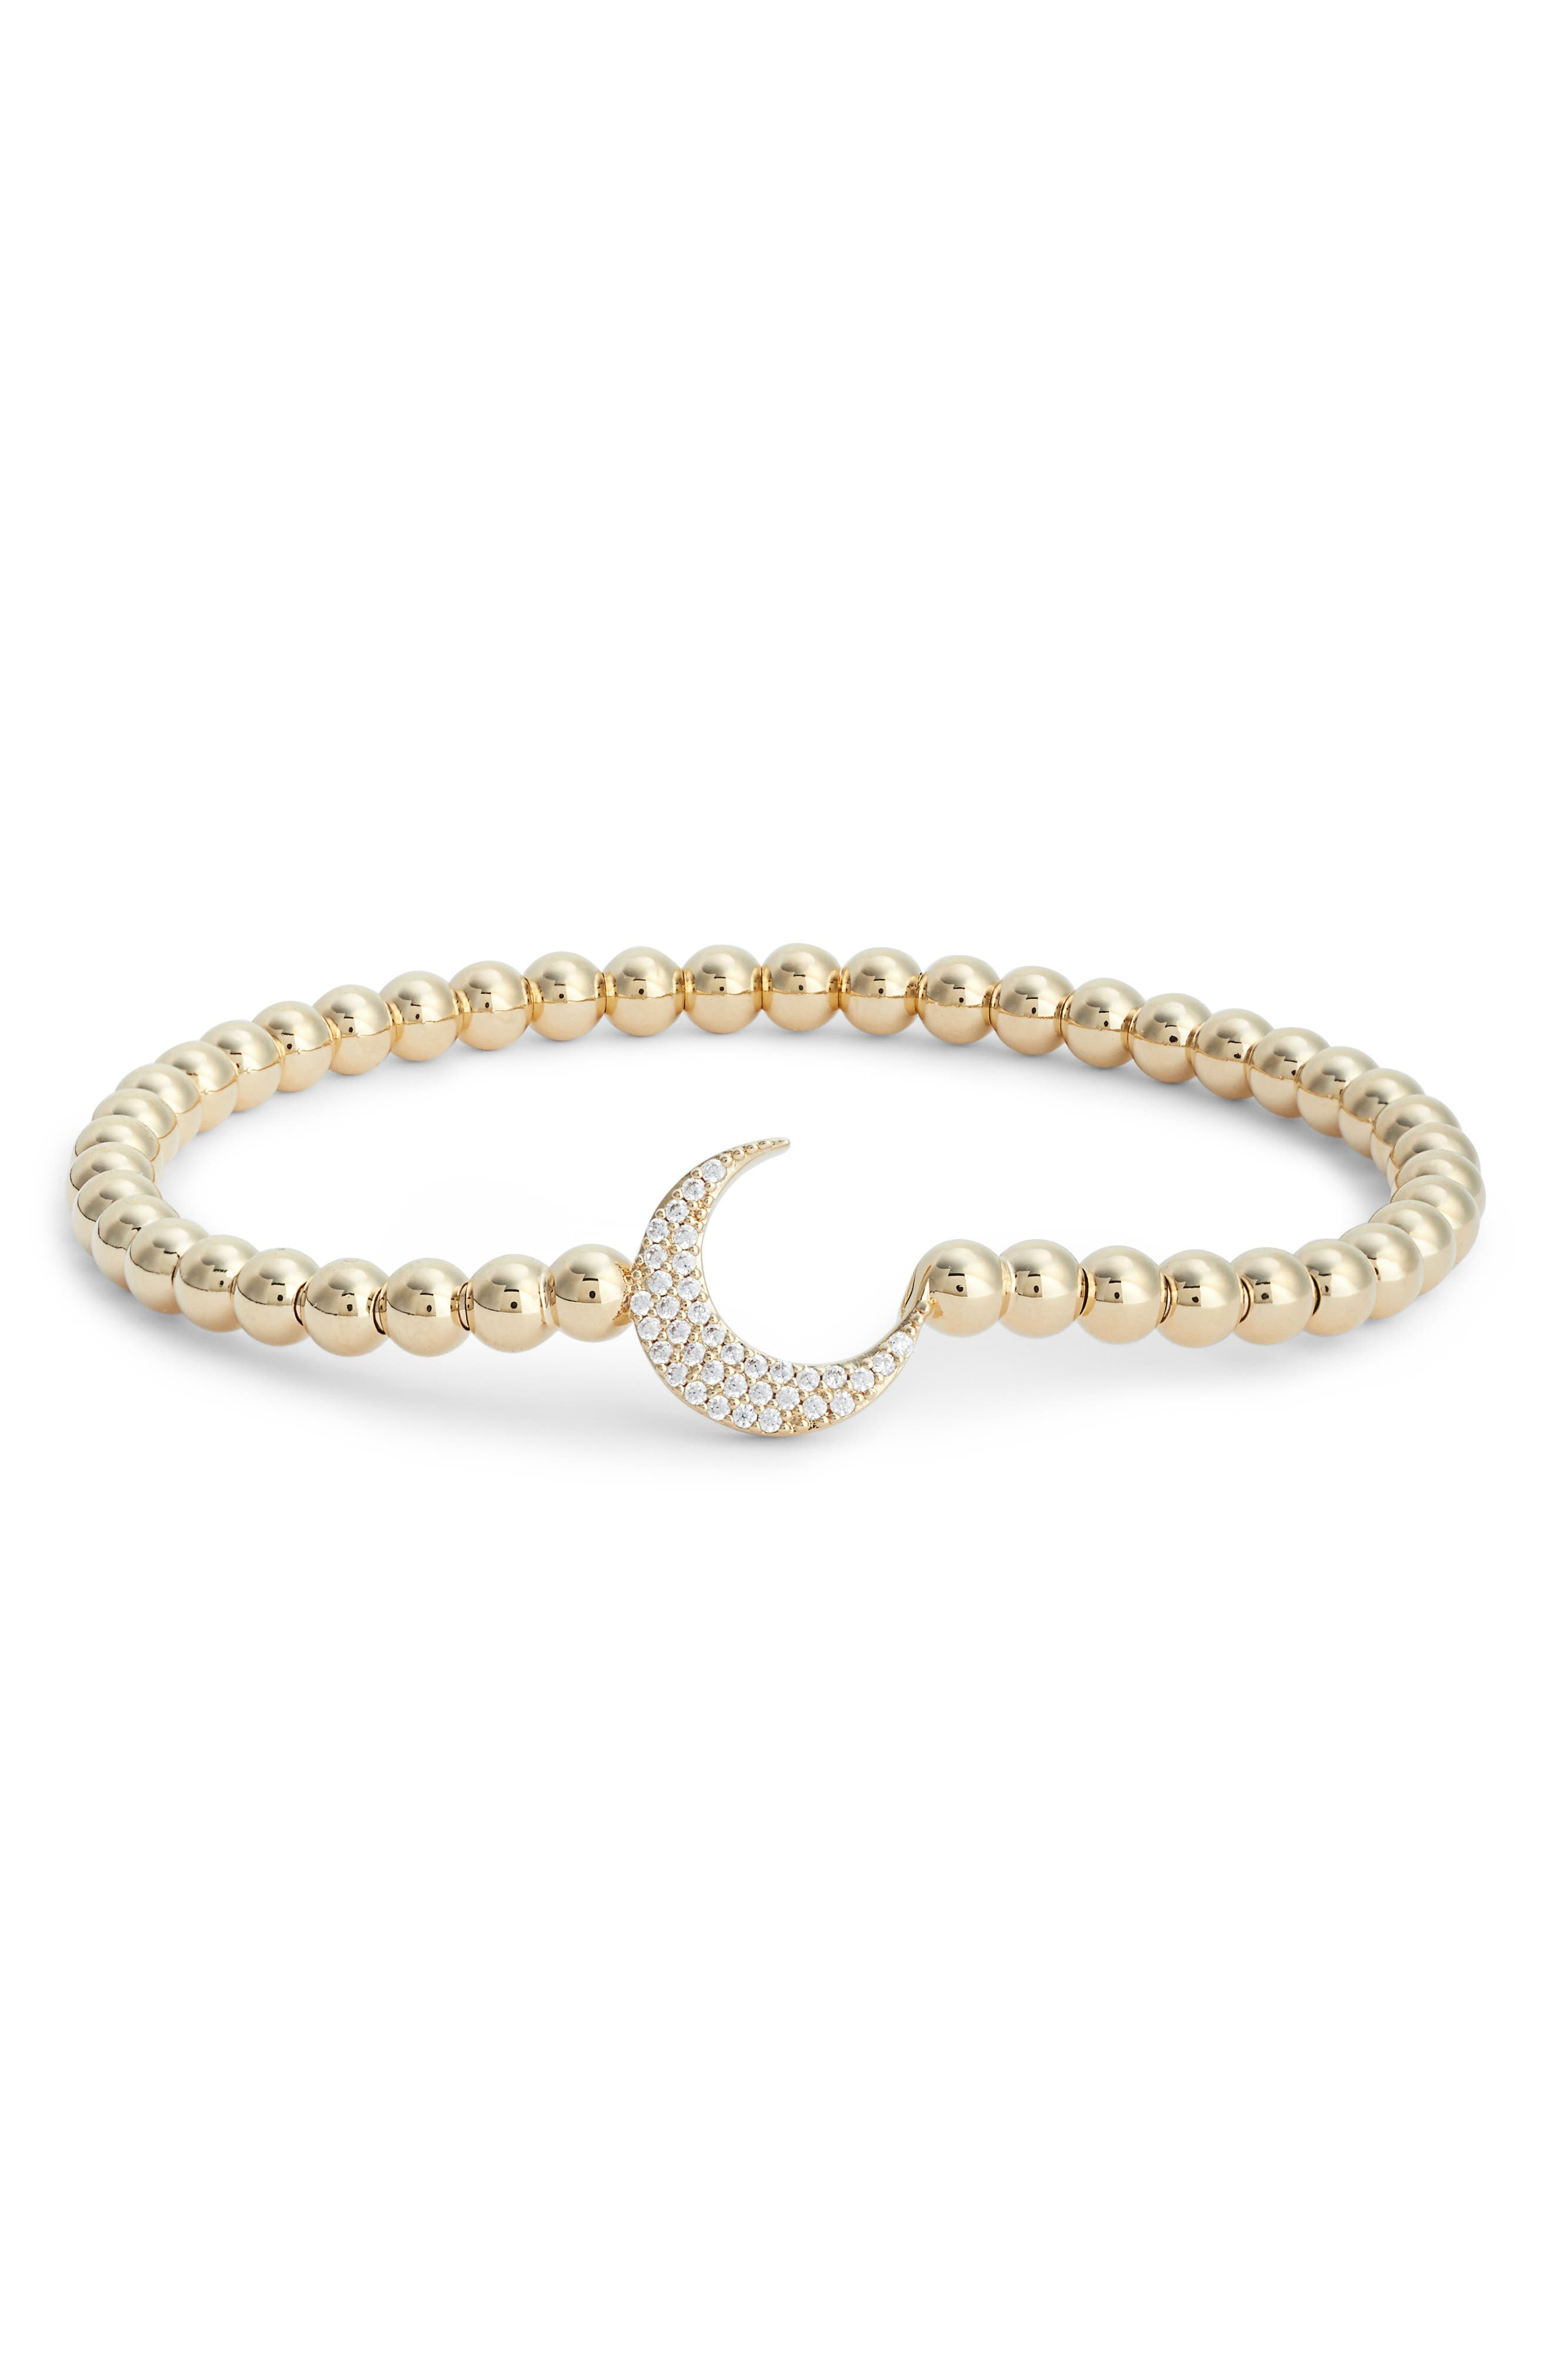 Cubic Zirconia Crescent Moon Circle Bracelet,                             Main thumbnail 1, color,                             Gold/ Clear